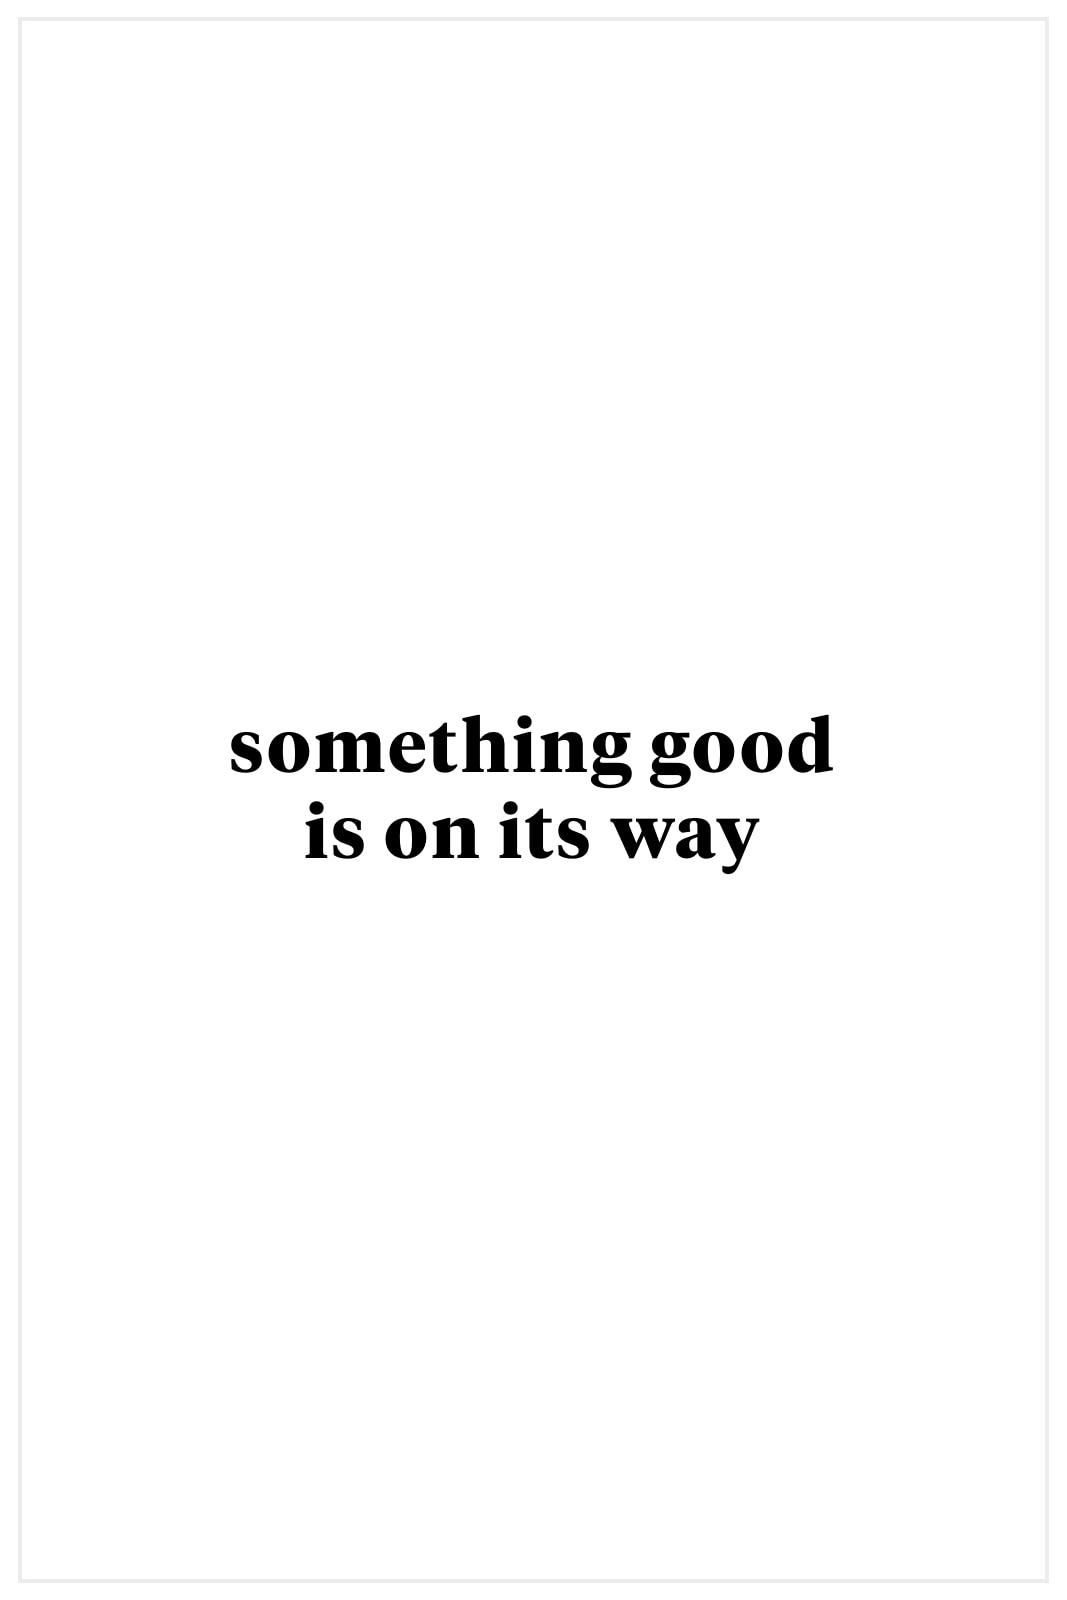 Mia berkeley Turq Tassle Necklace